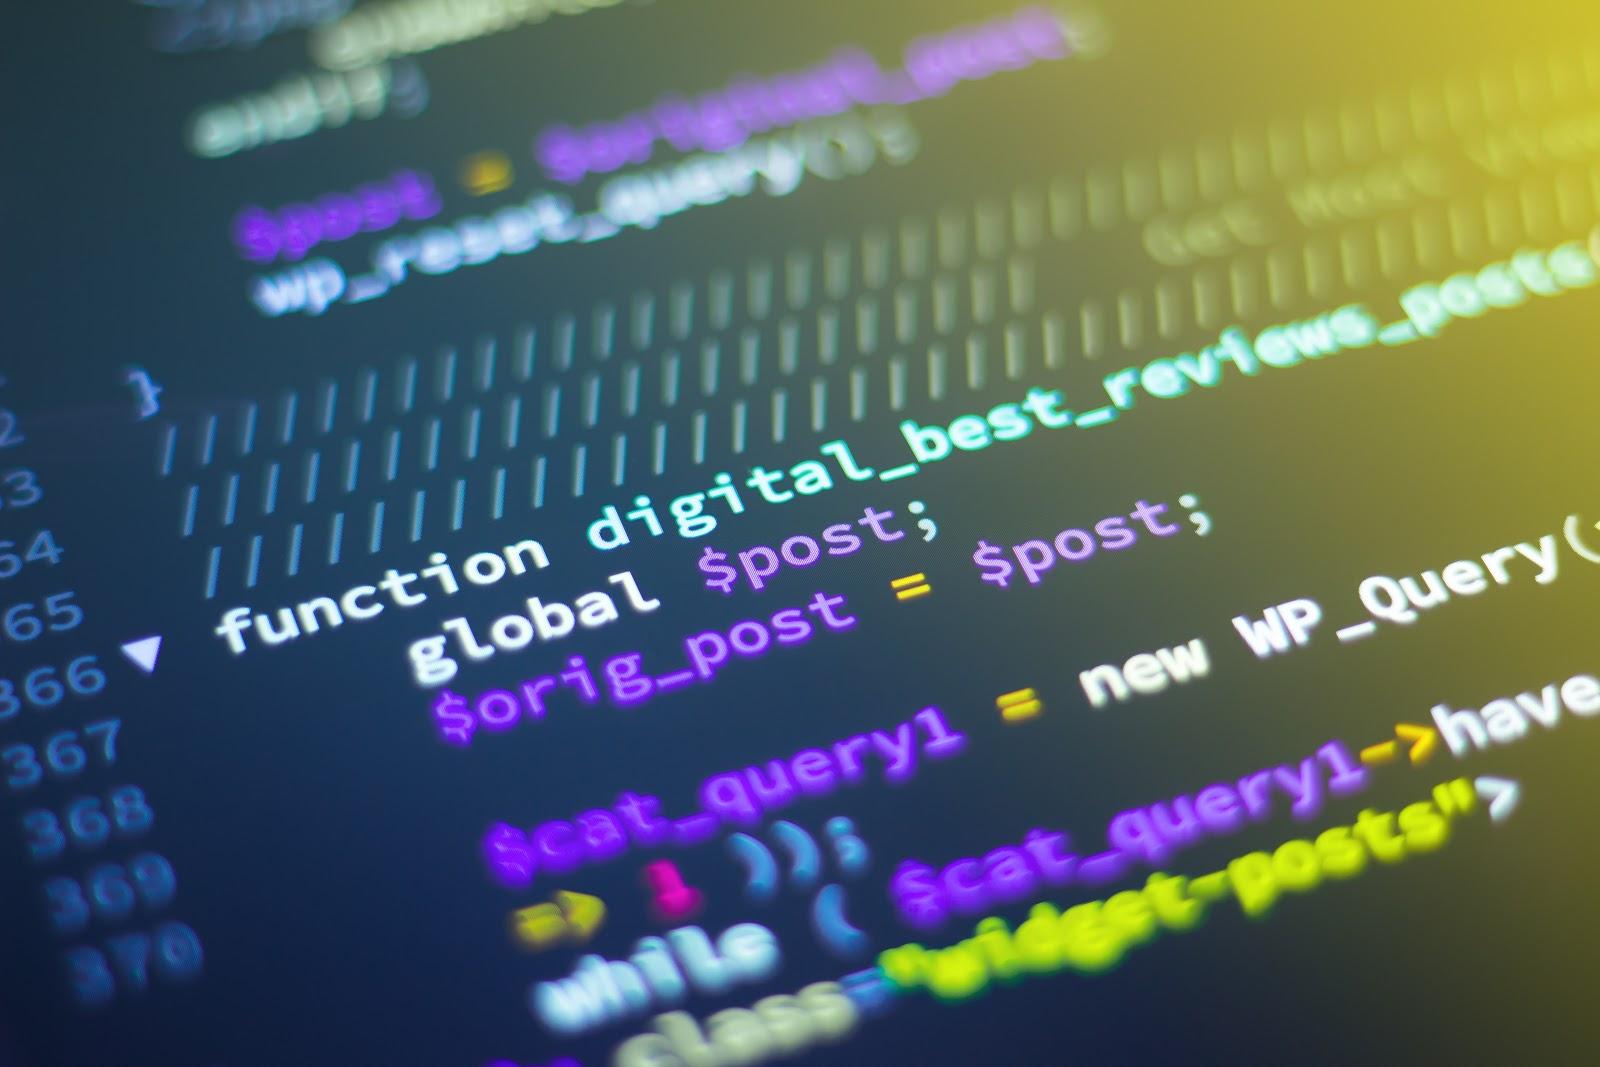 Mengapa Python baik untuk Data Analitik?